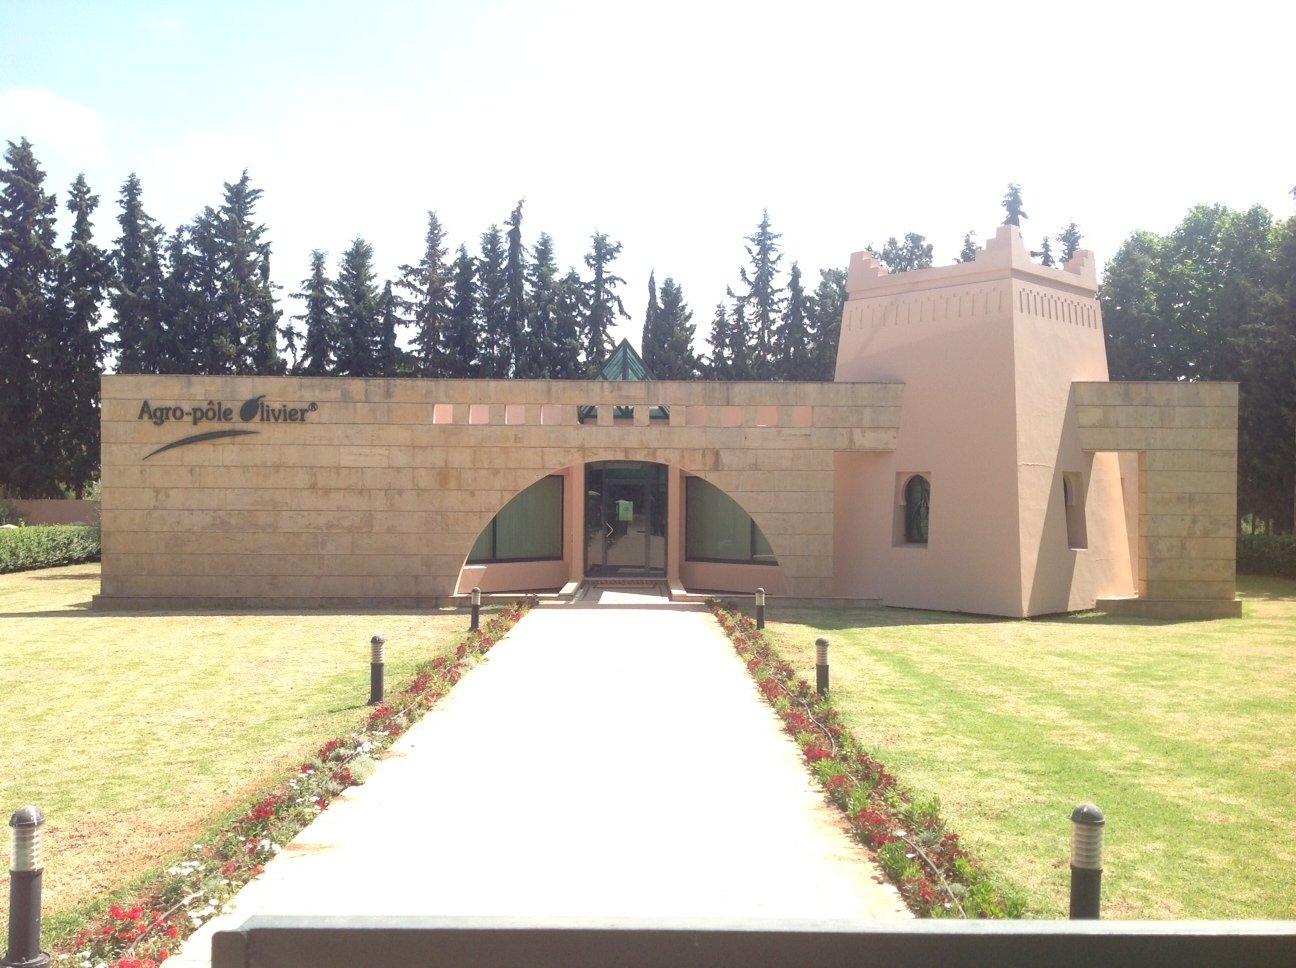 Marocco oleario in gran forma